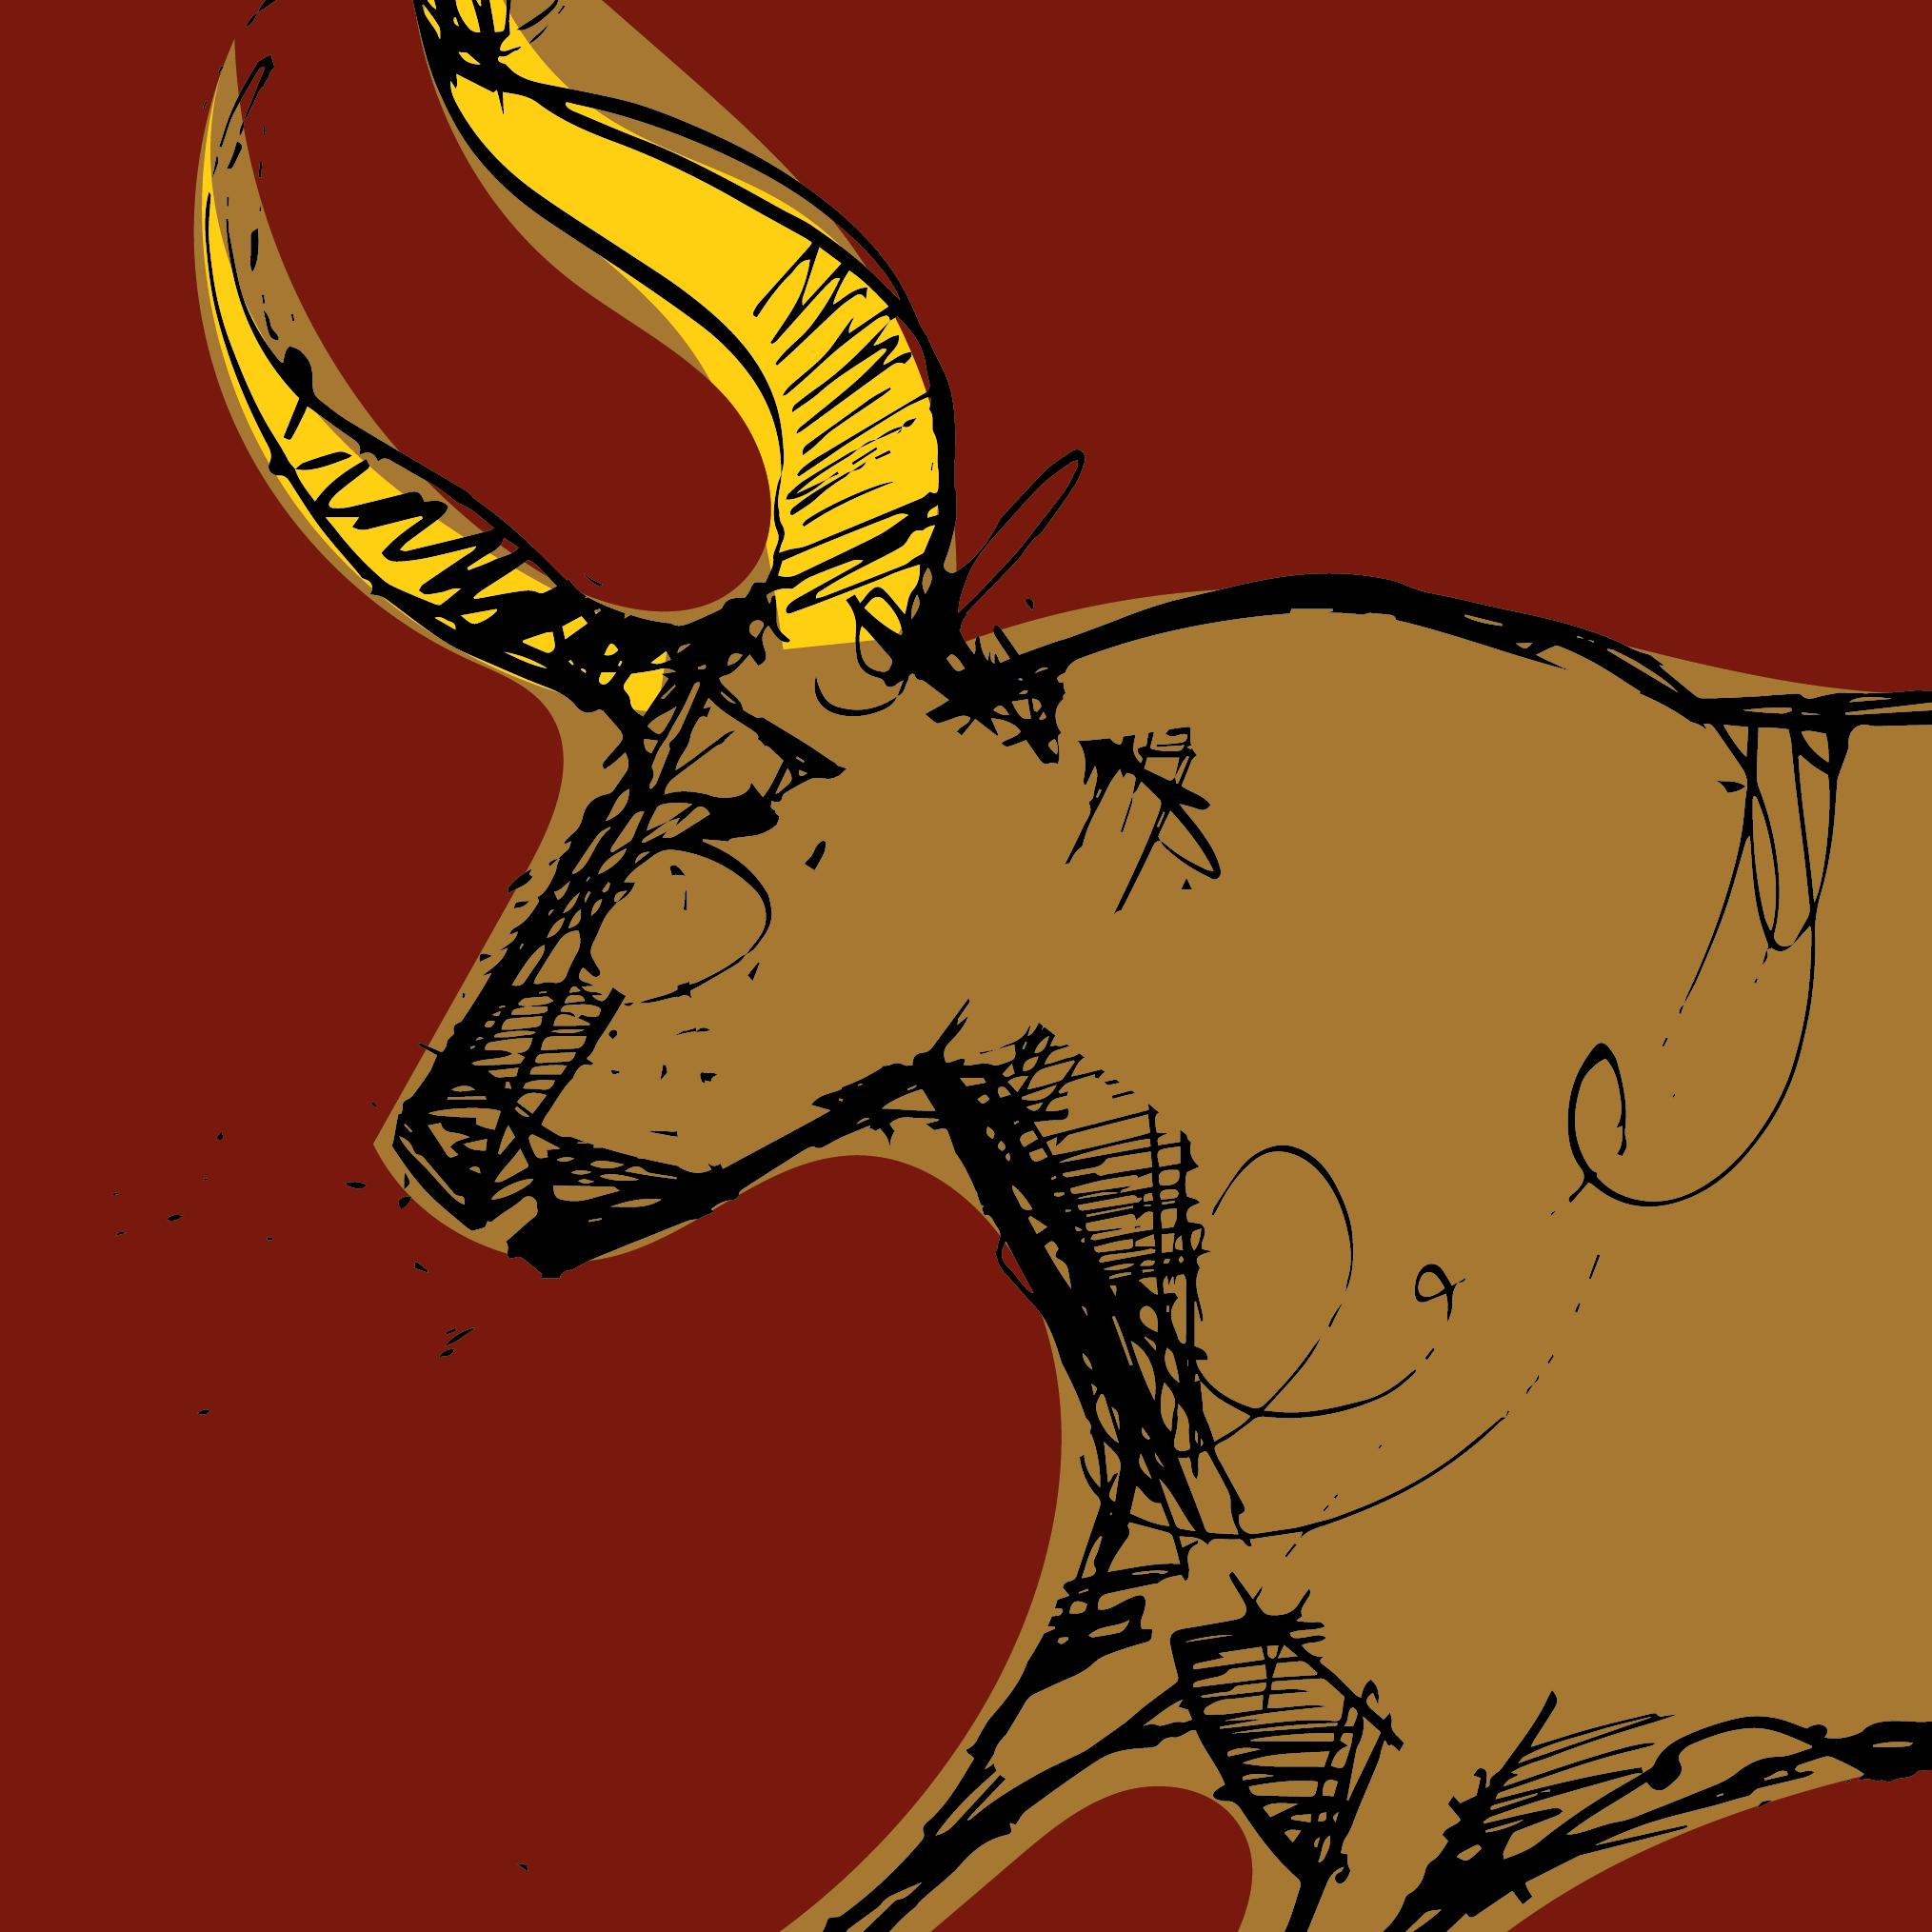 Stier-Illustration